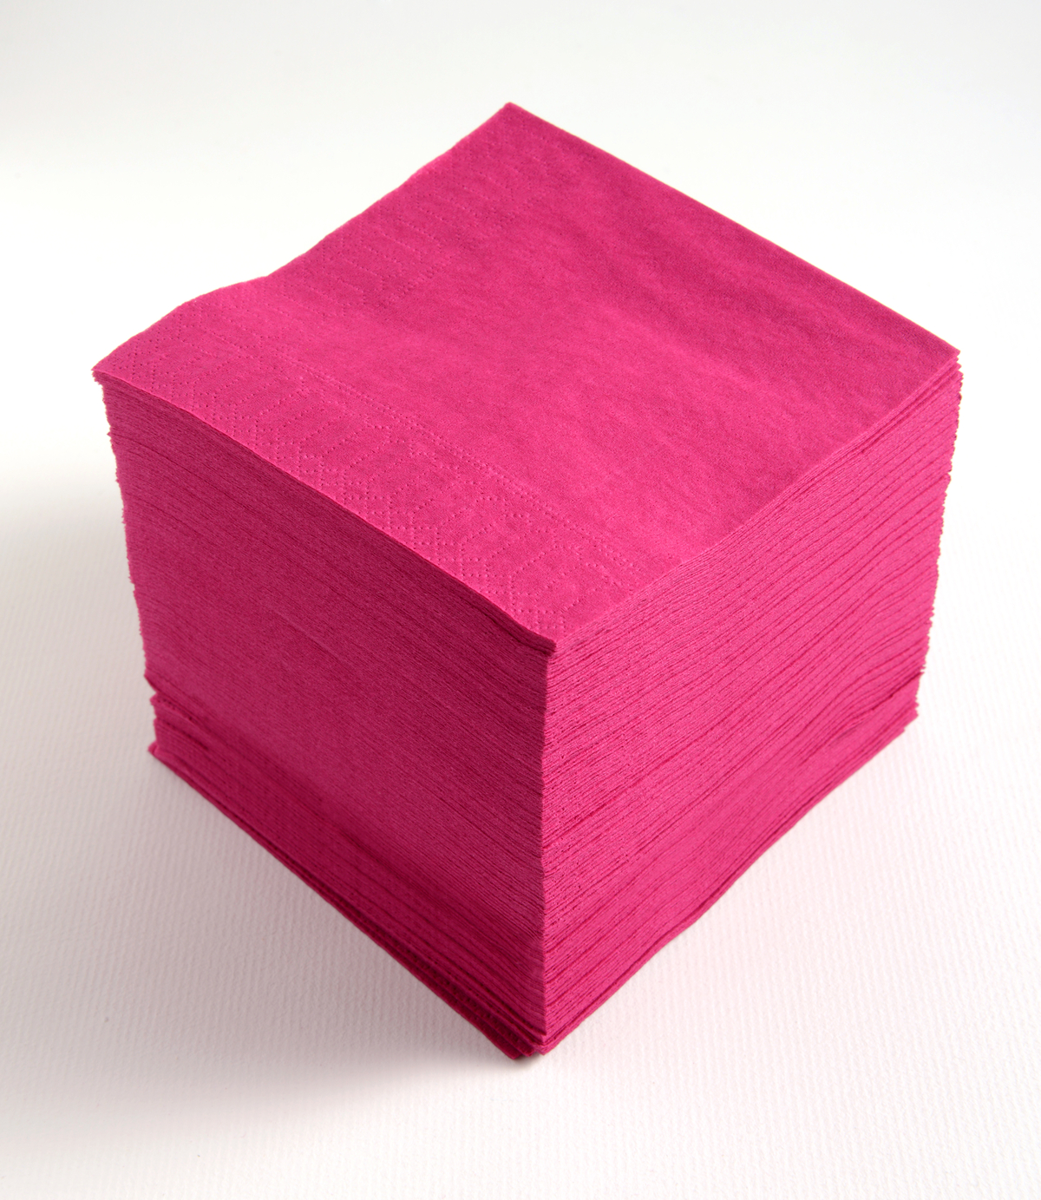 Serviette framboise ouate de cellulose 20x20 cm Celi Ouate Cgmp (100 pièces)